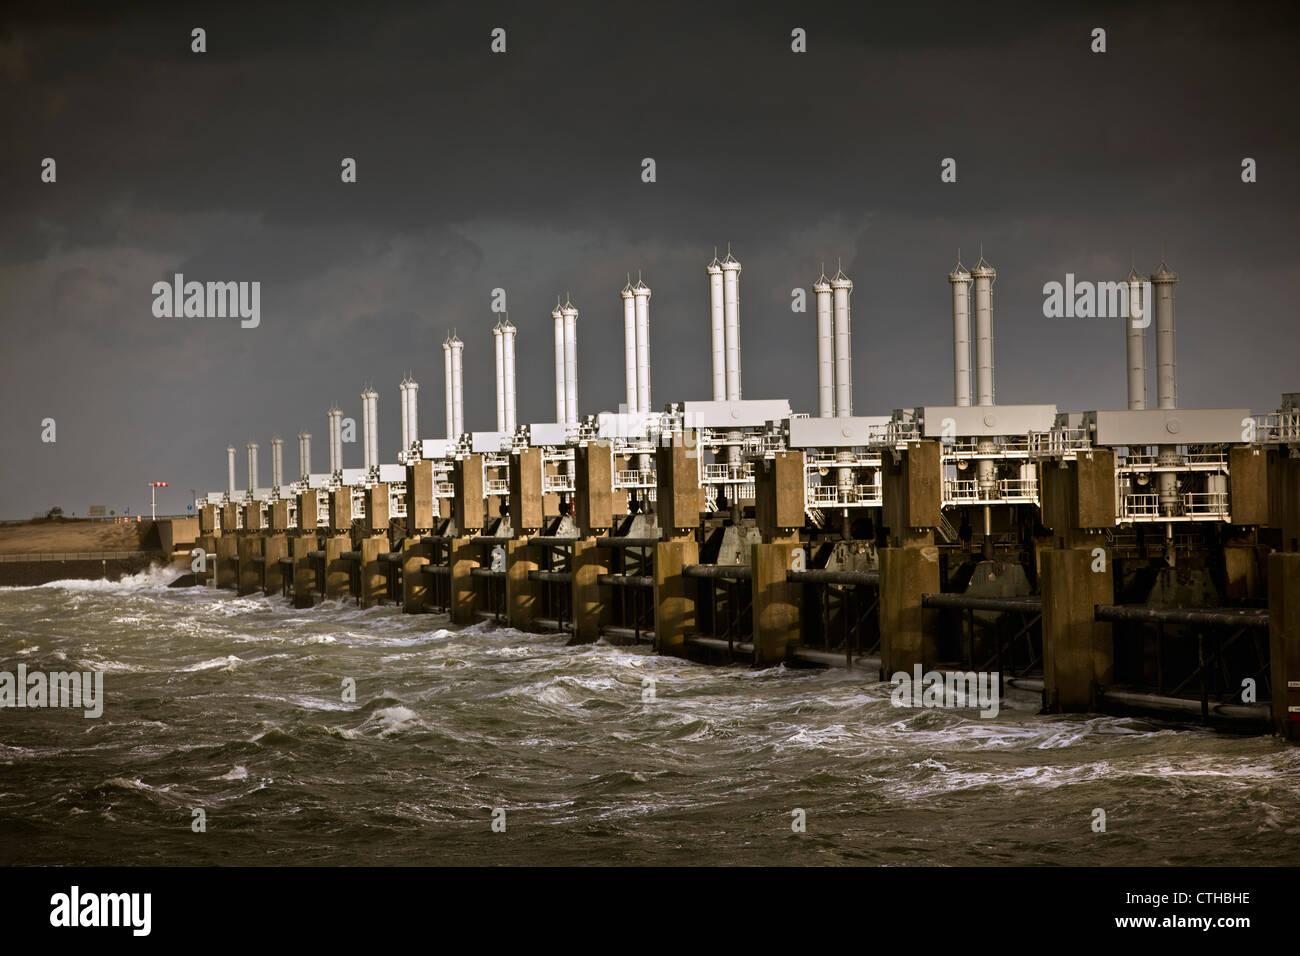 I Paesi Bassi, Kamperland, Oosterschelde Flood Barrier. Parte delle opere del Delta. Immagini Stock